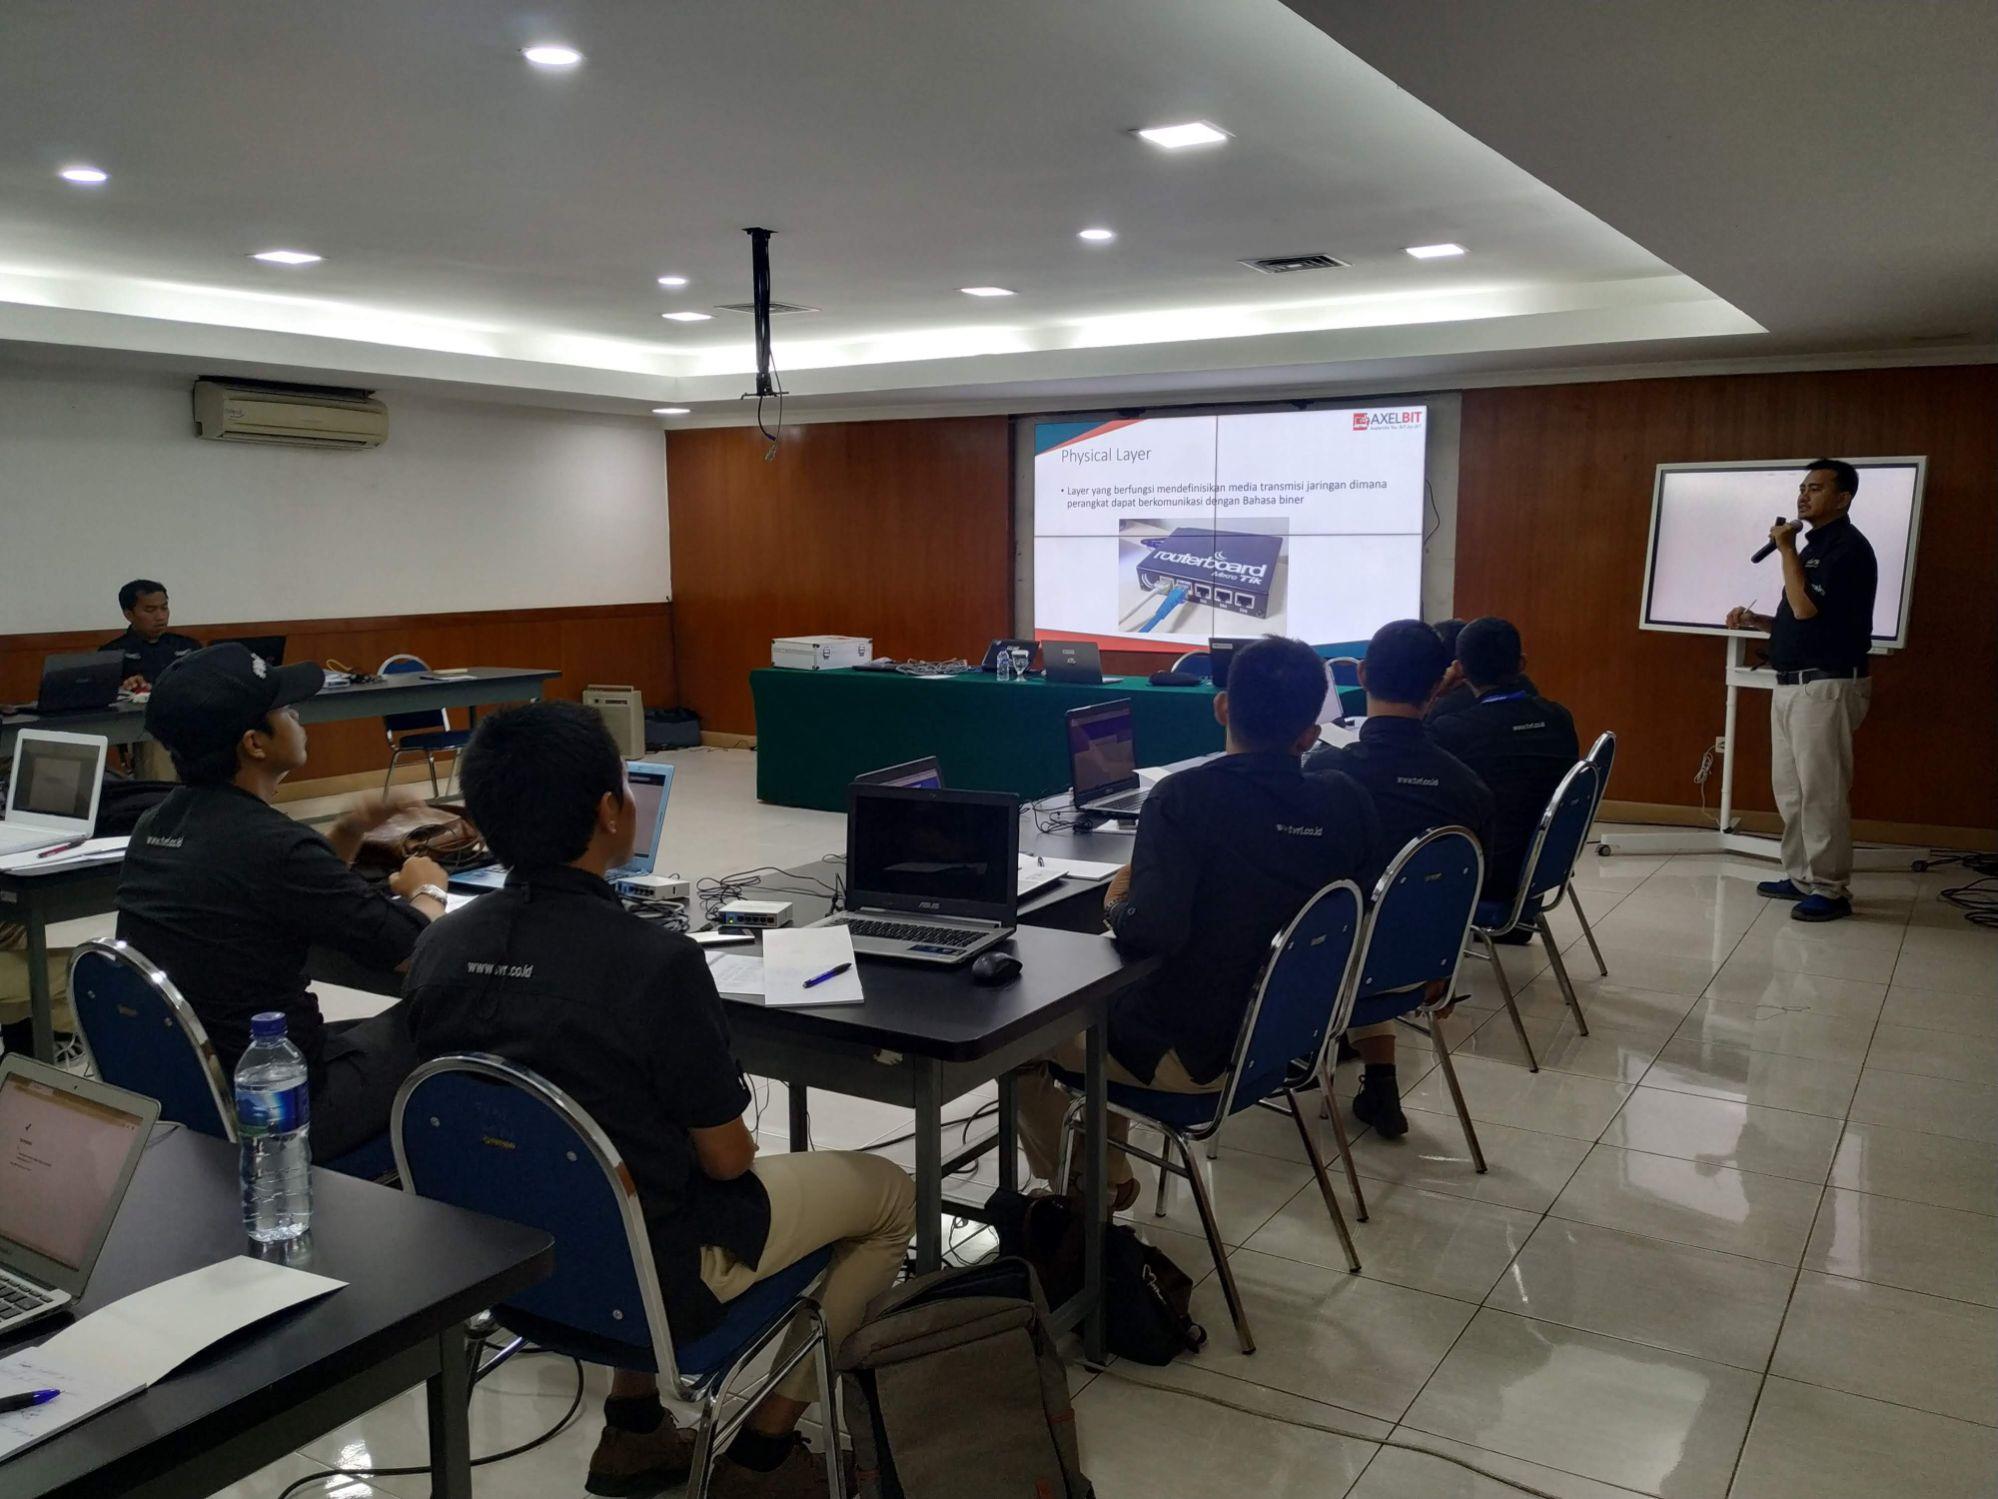 belajar, mikrotik, sertifikasi, training, IMG_20190311_103203